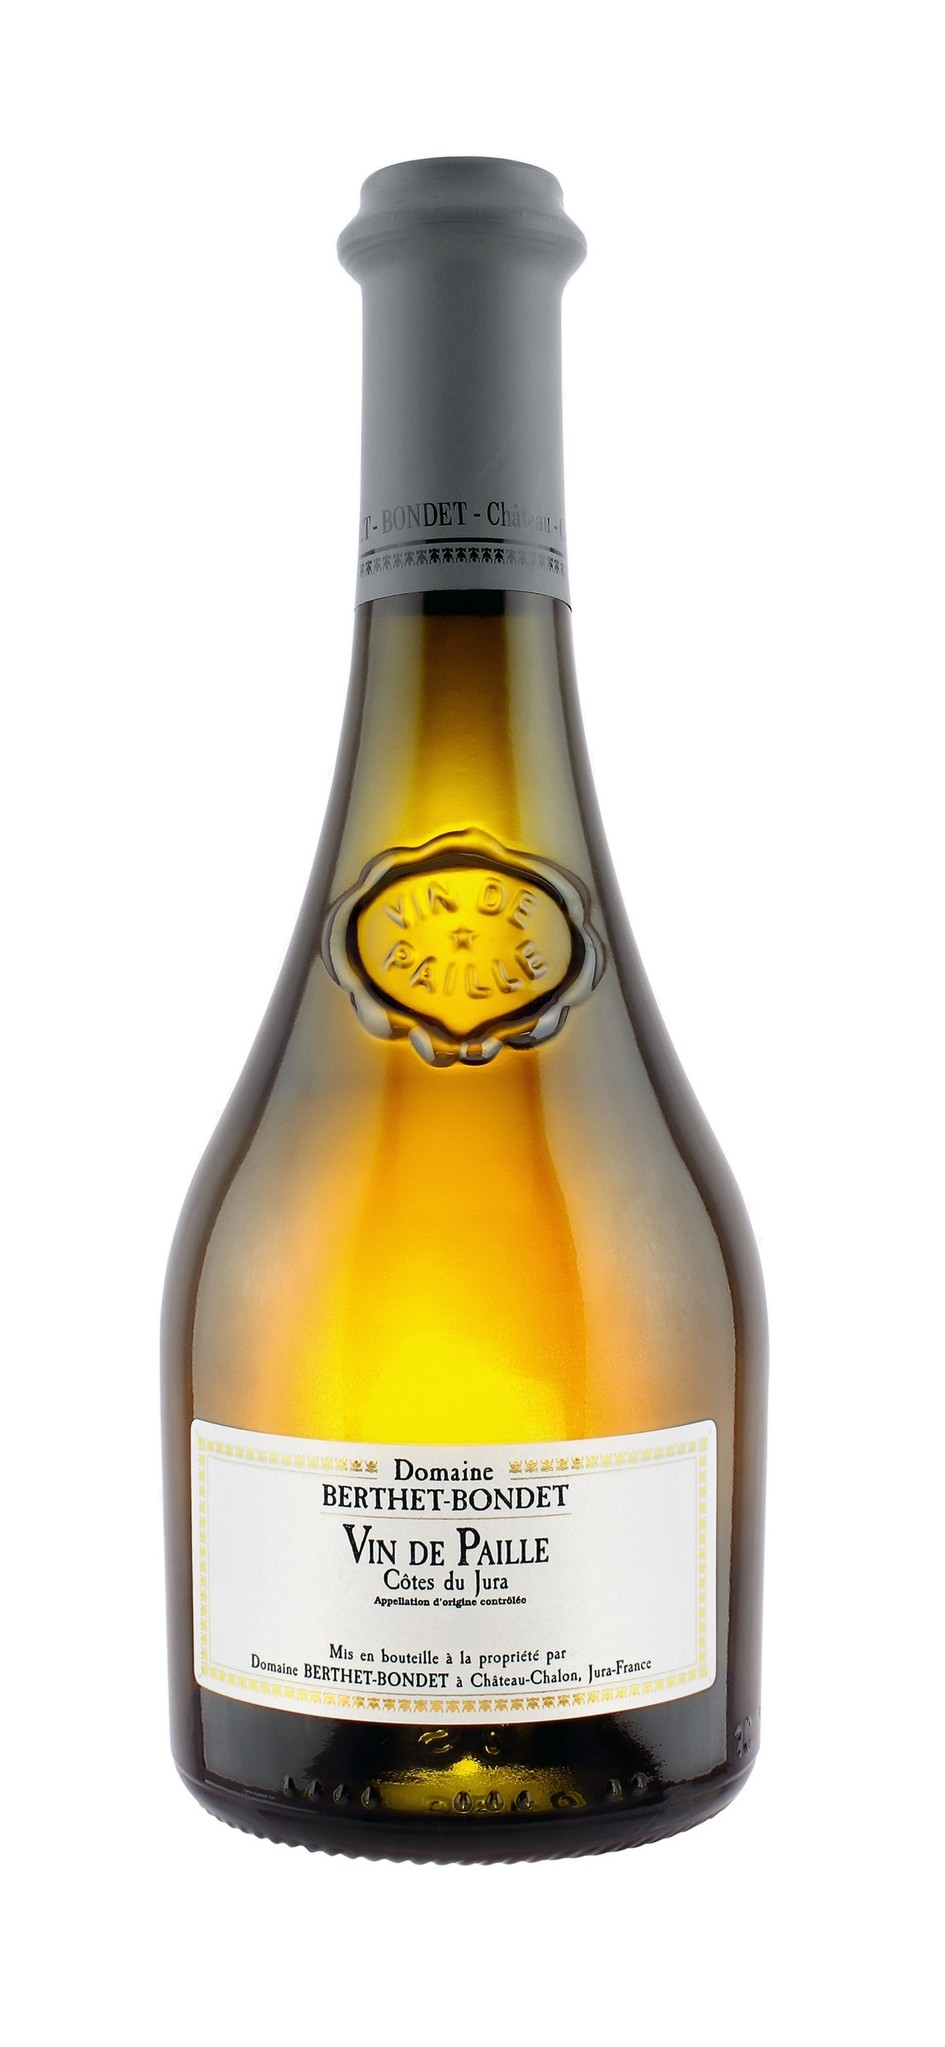 Berthet-Bondet - Jura 2015 Vin de Paille Cotes du Jura, Berthet-Bondet 0,375L